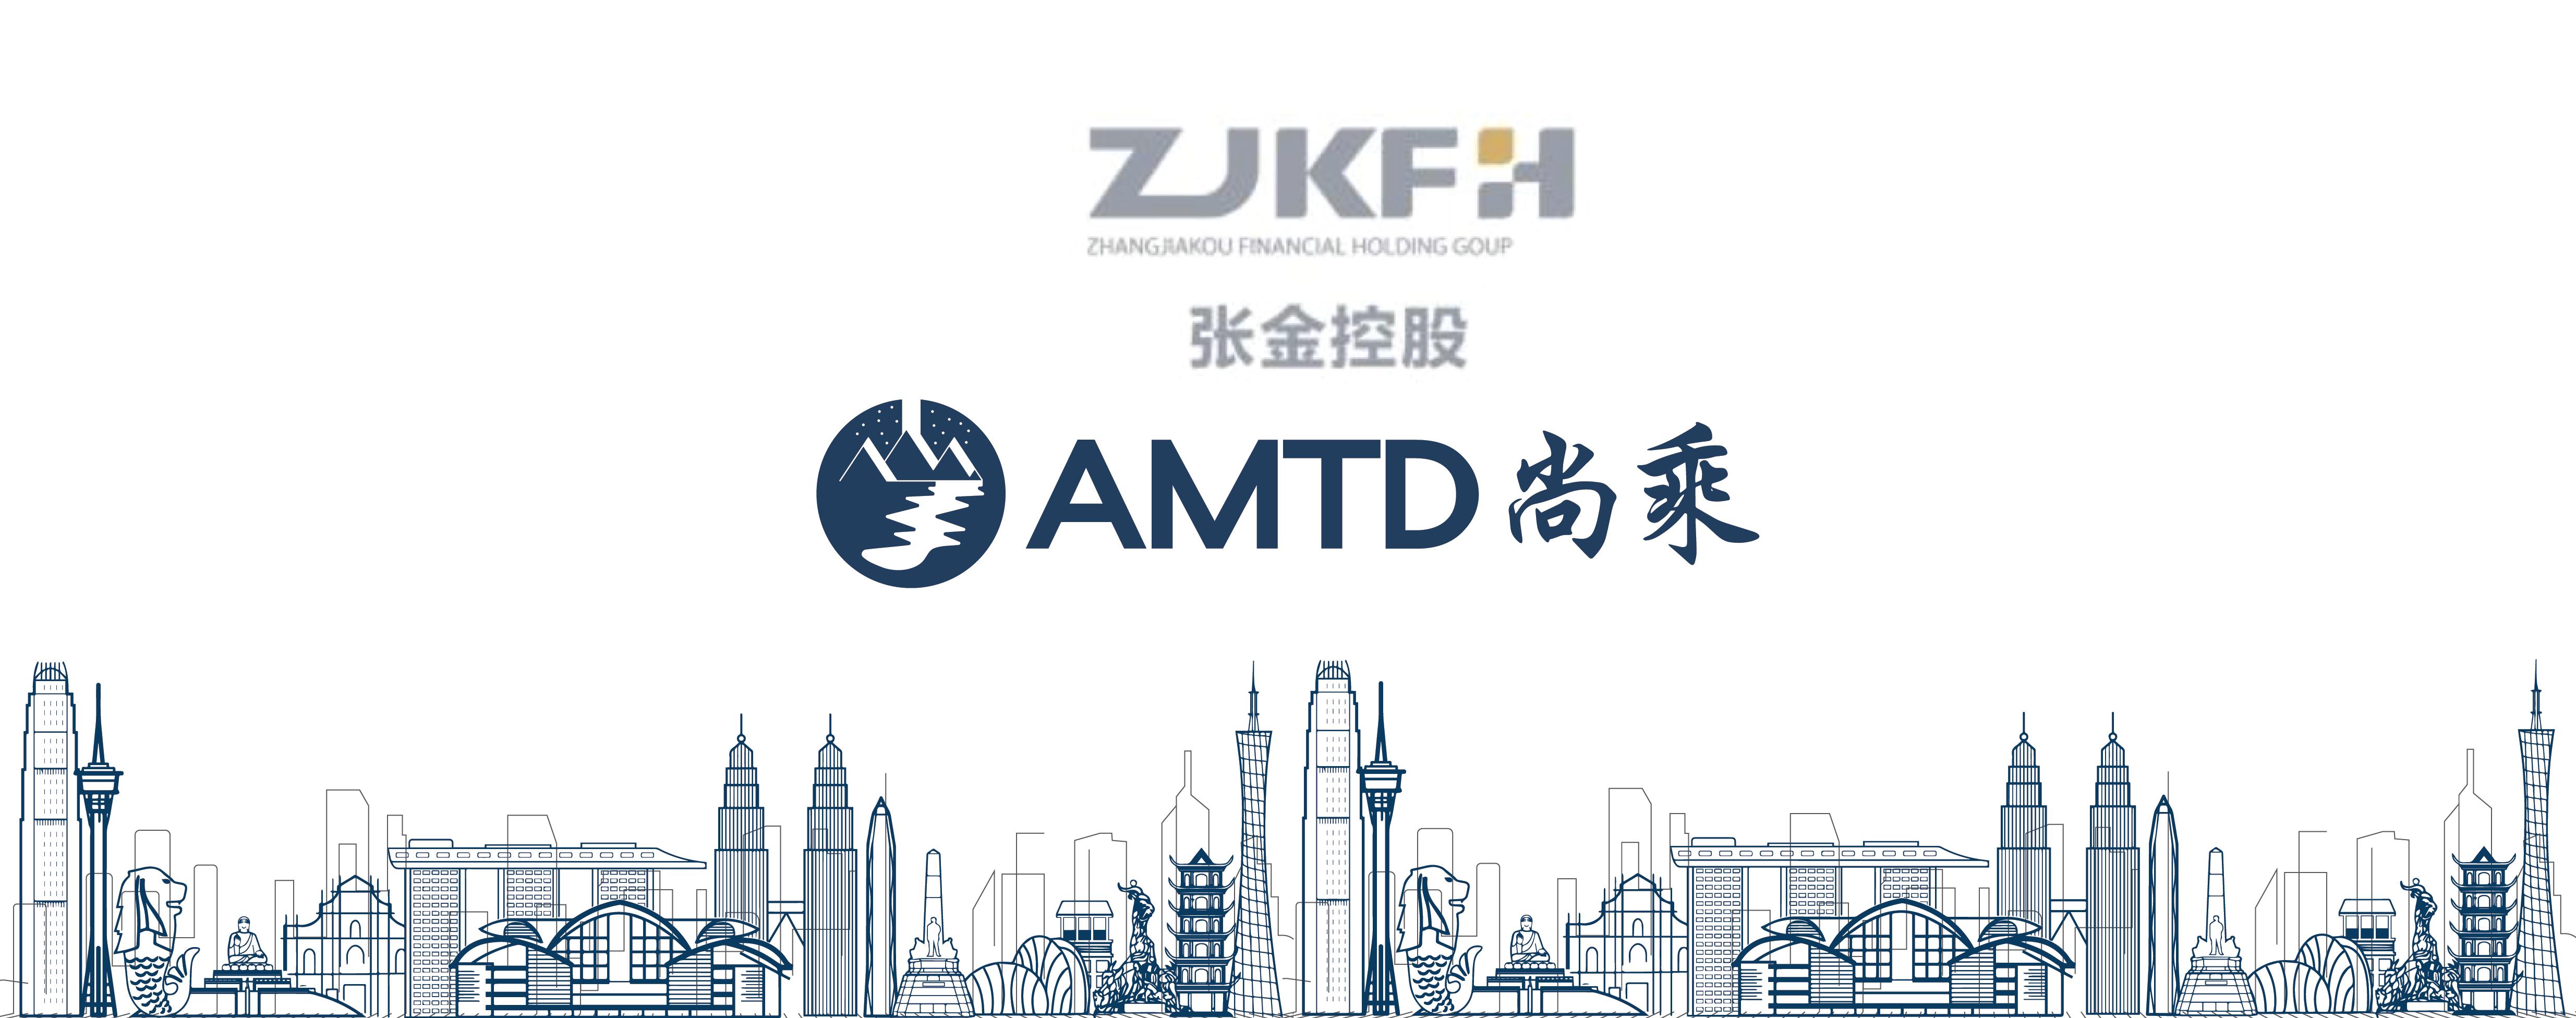 AMTD Deals | ZJKF's US$92.8m 4.300% 3-Year Senior Bond Debut Offering